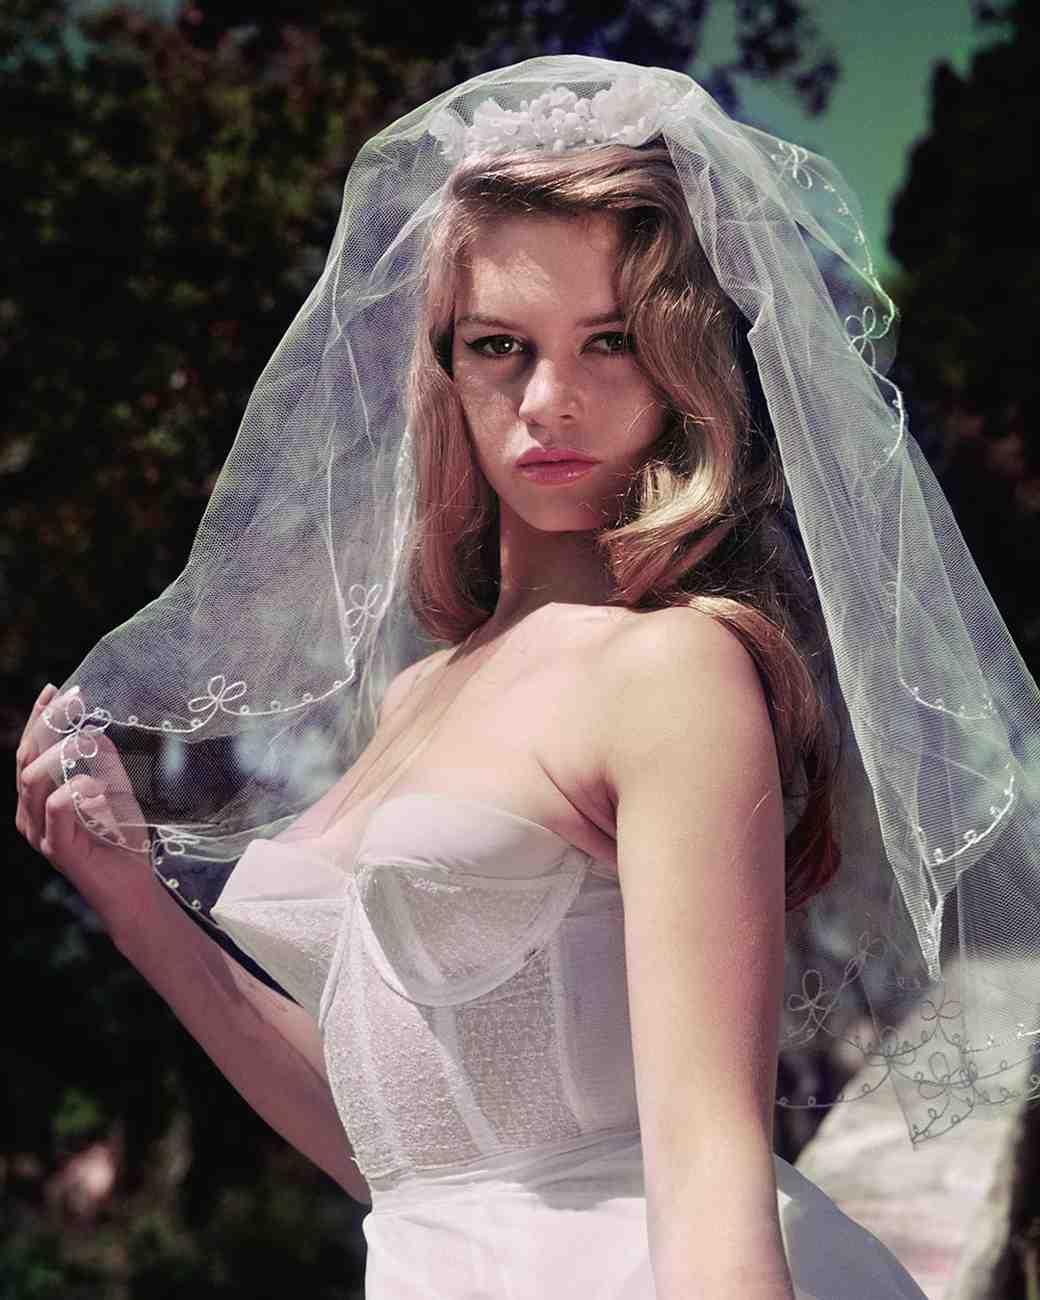 movie-wedding-dresses-and-god-created-woman-brigitte-bardot-0316.jpg